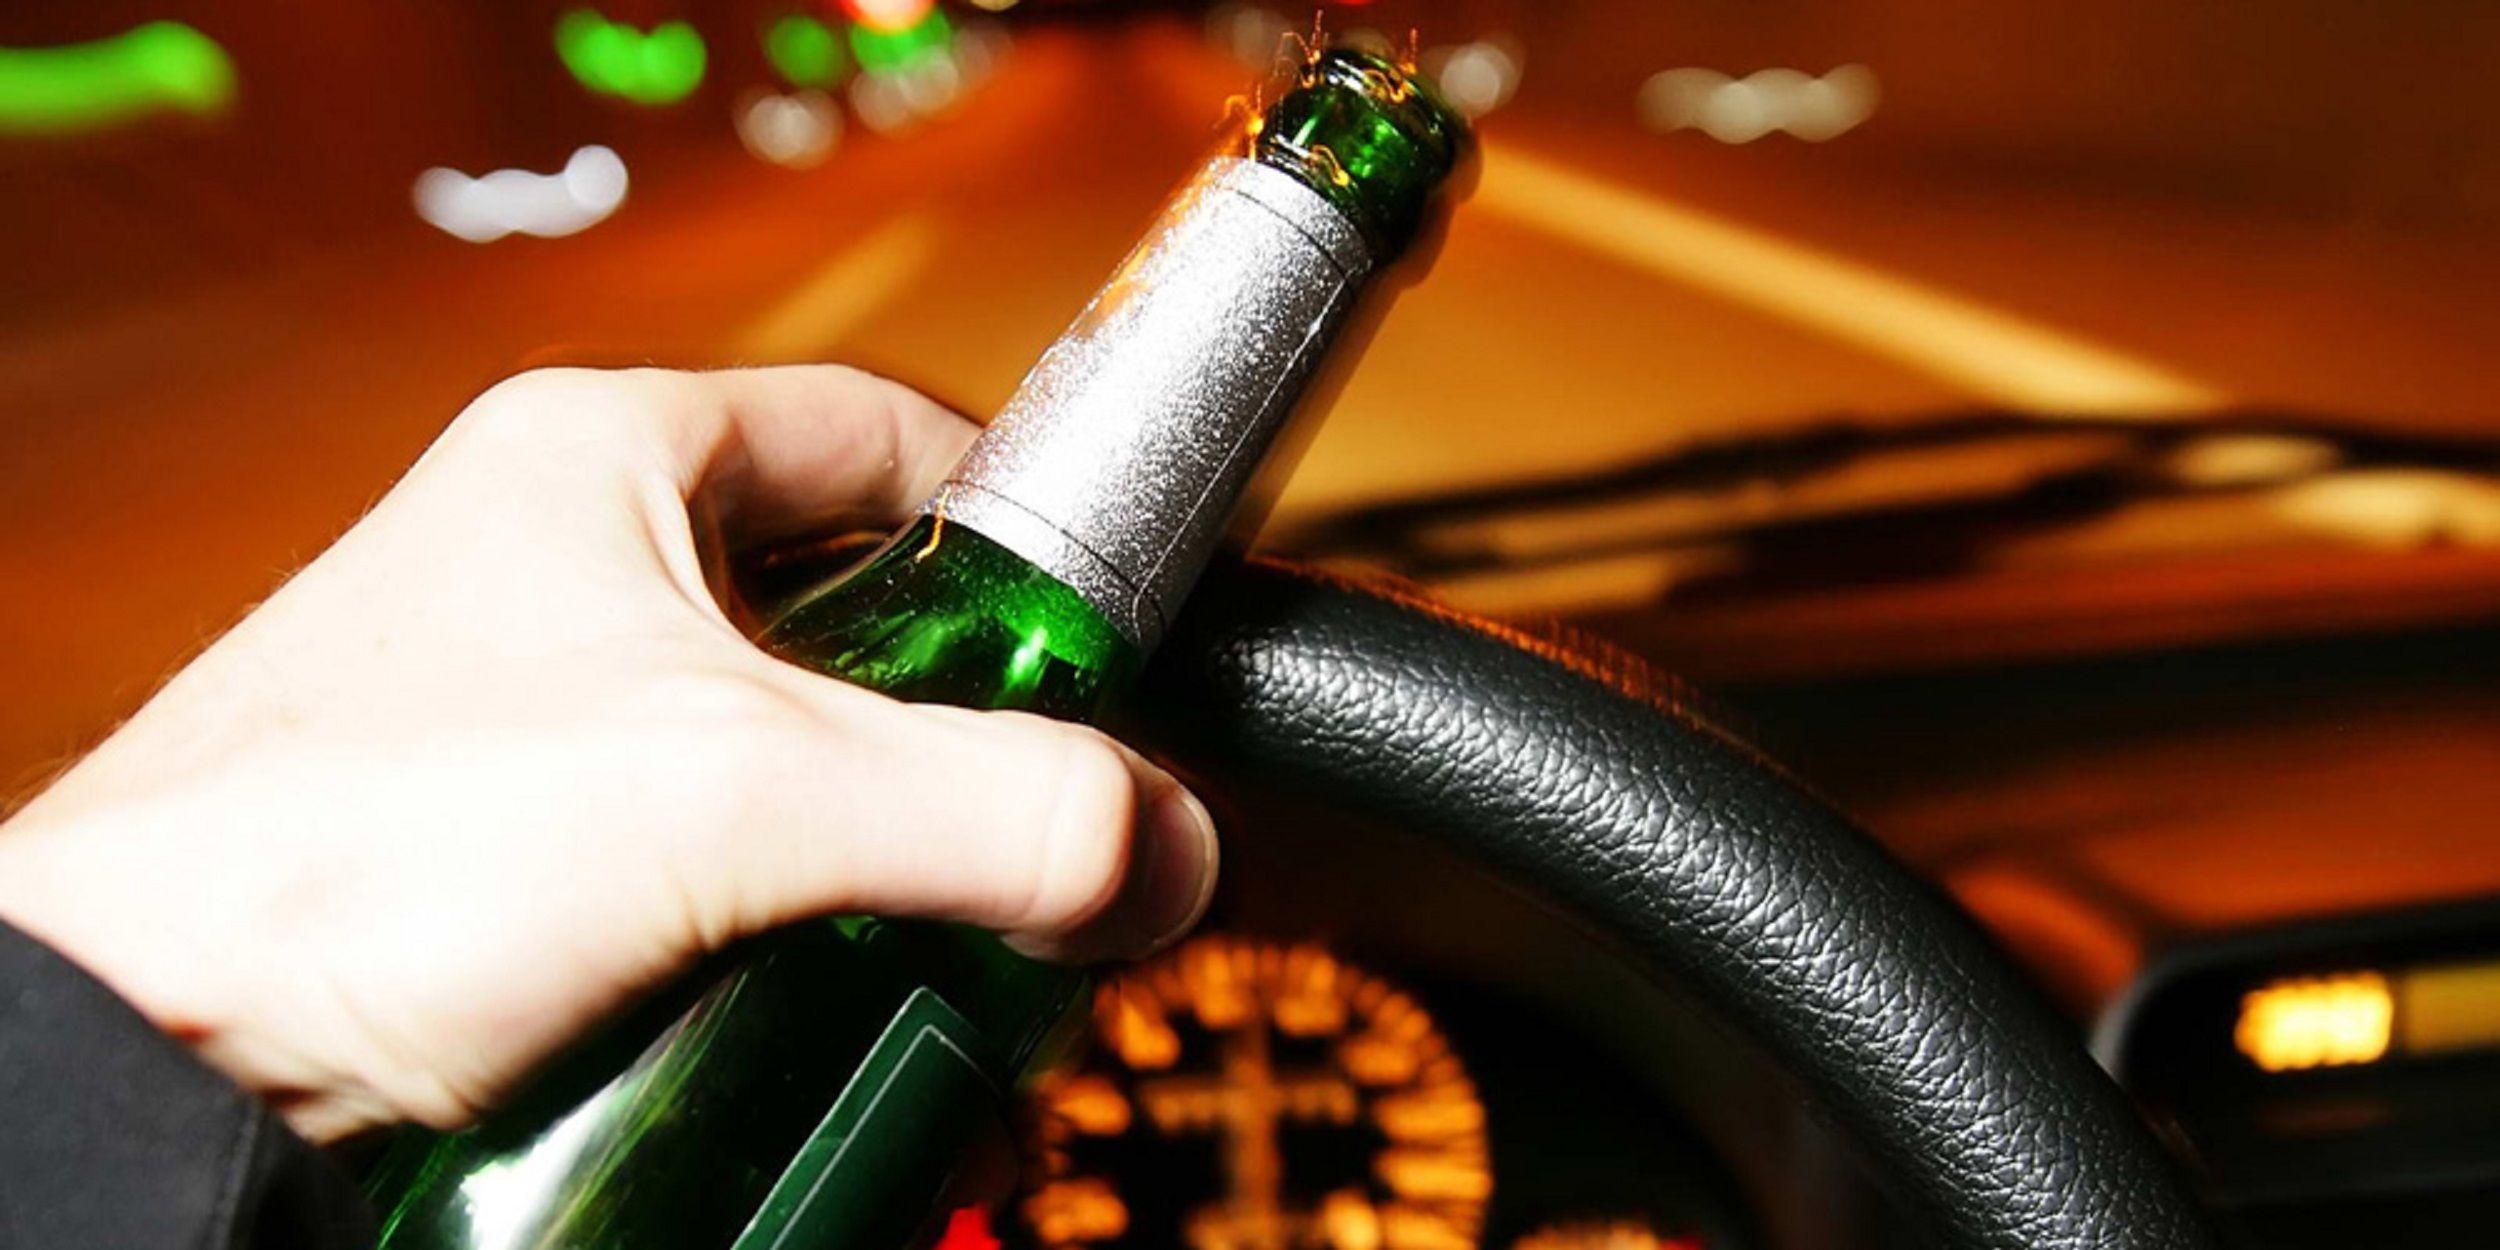 Conducir con alcohol. Imagen de archivo